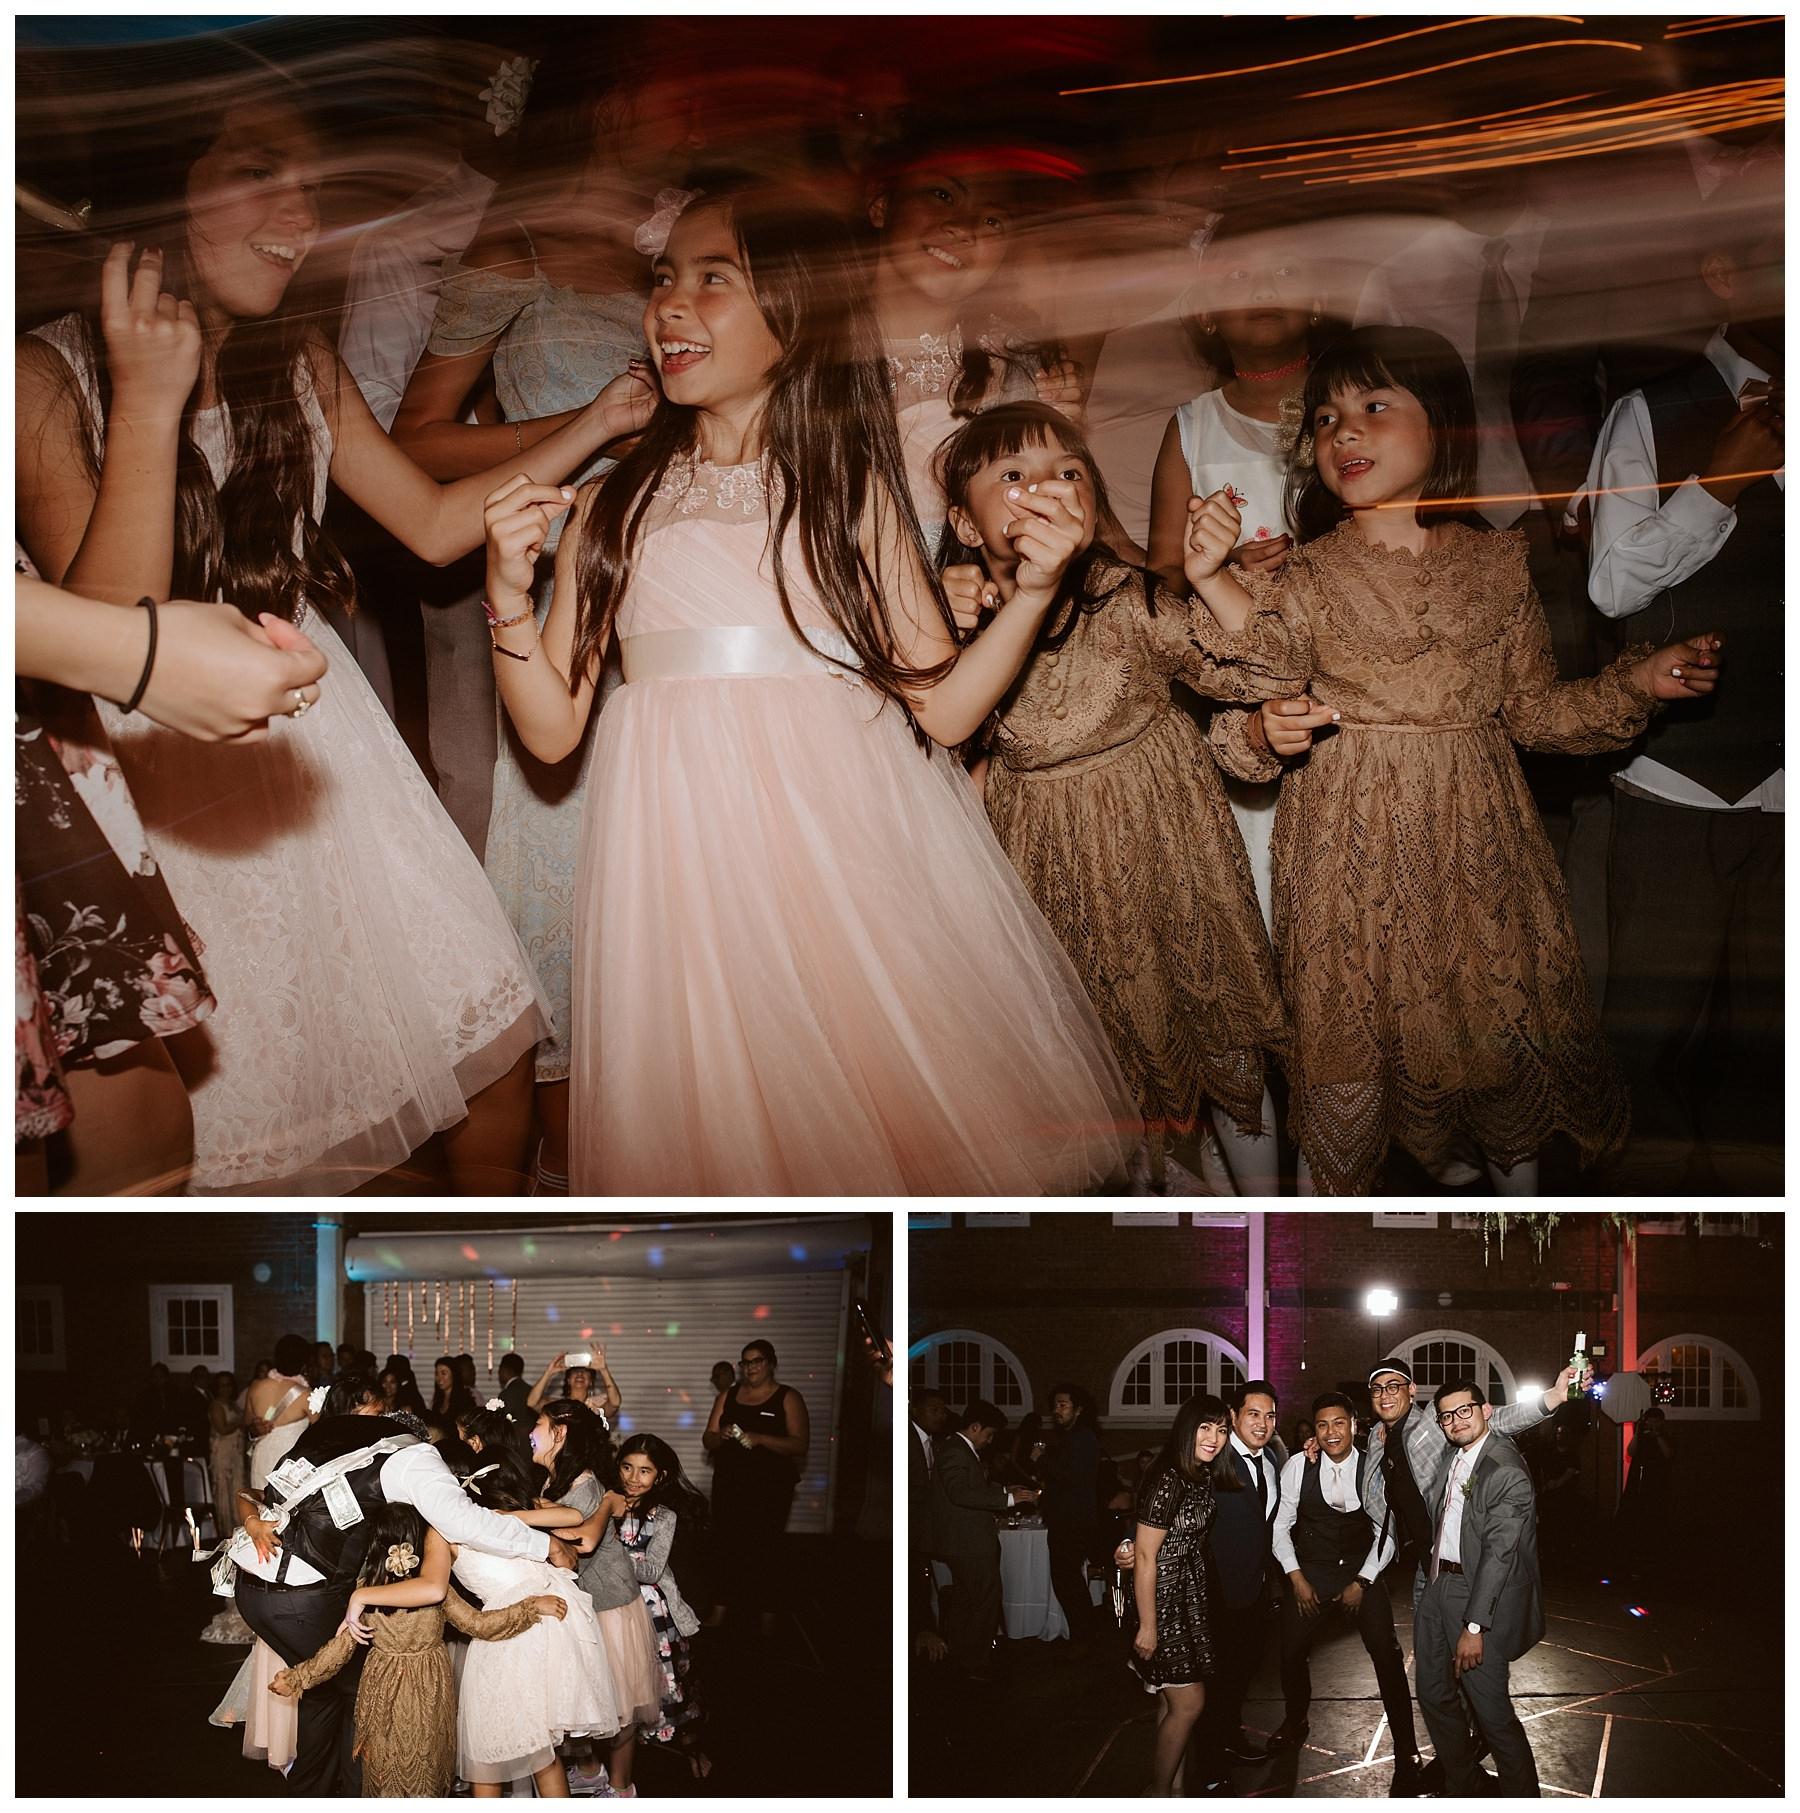 Brick_San_Diego_wedding_0055.jpg